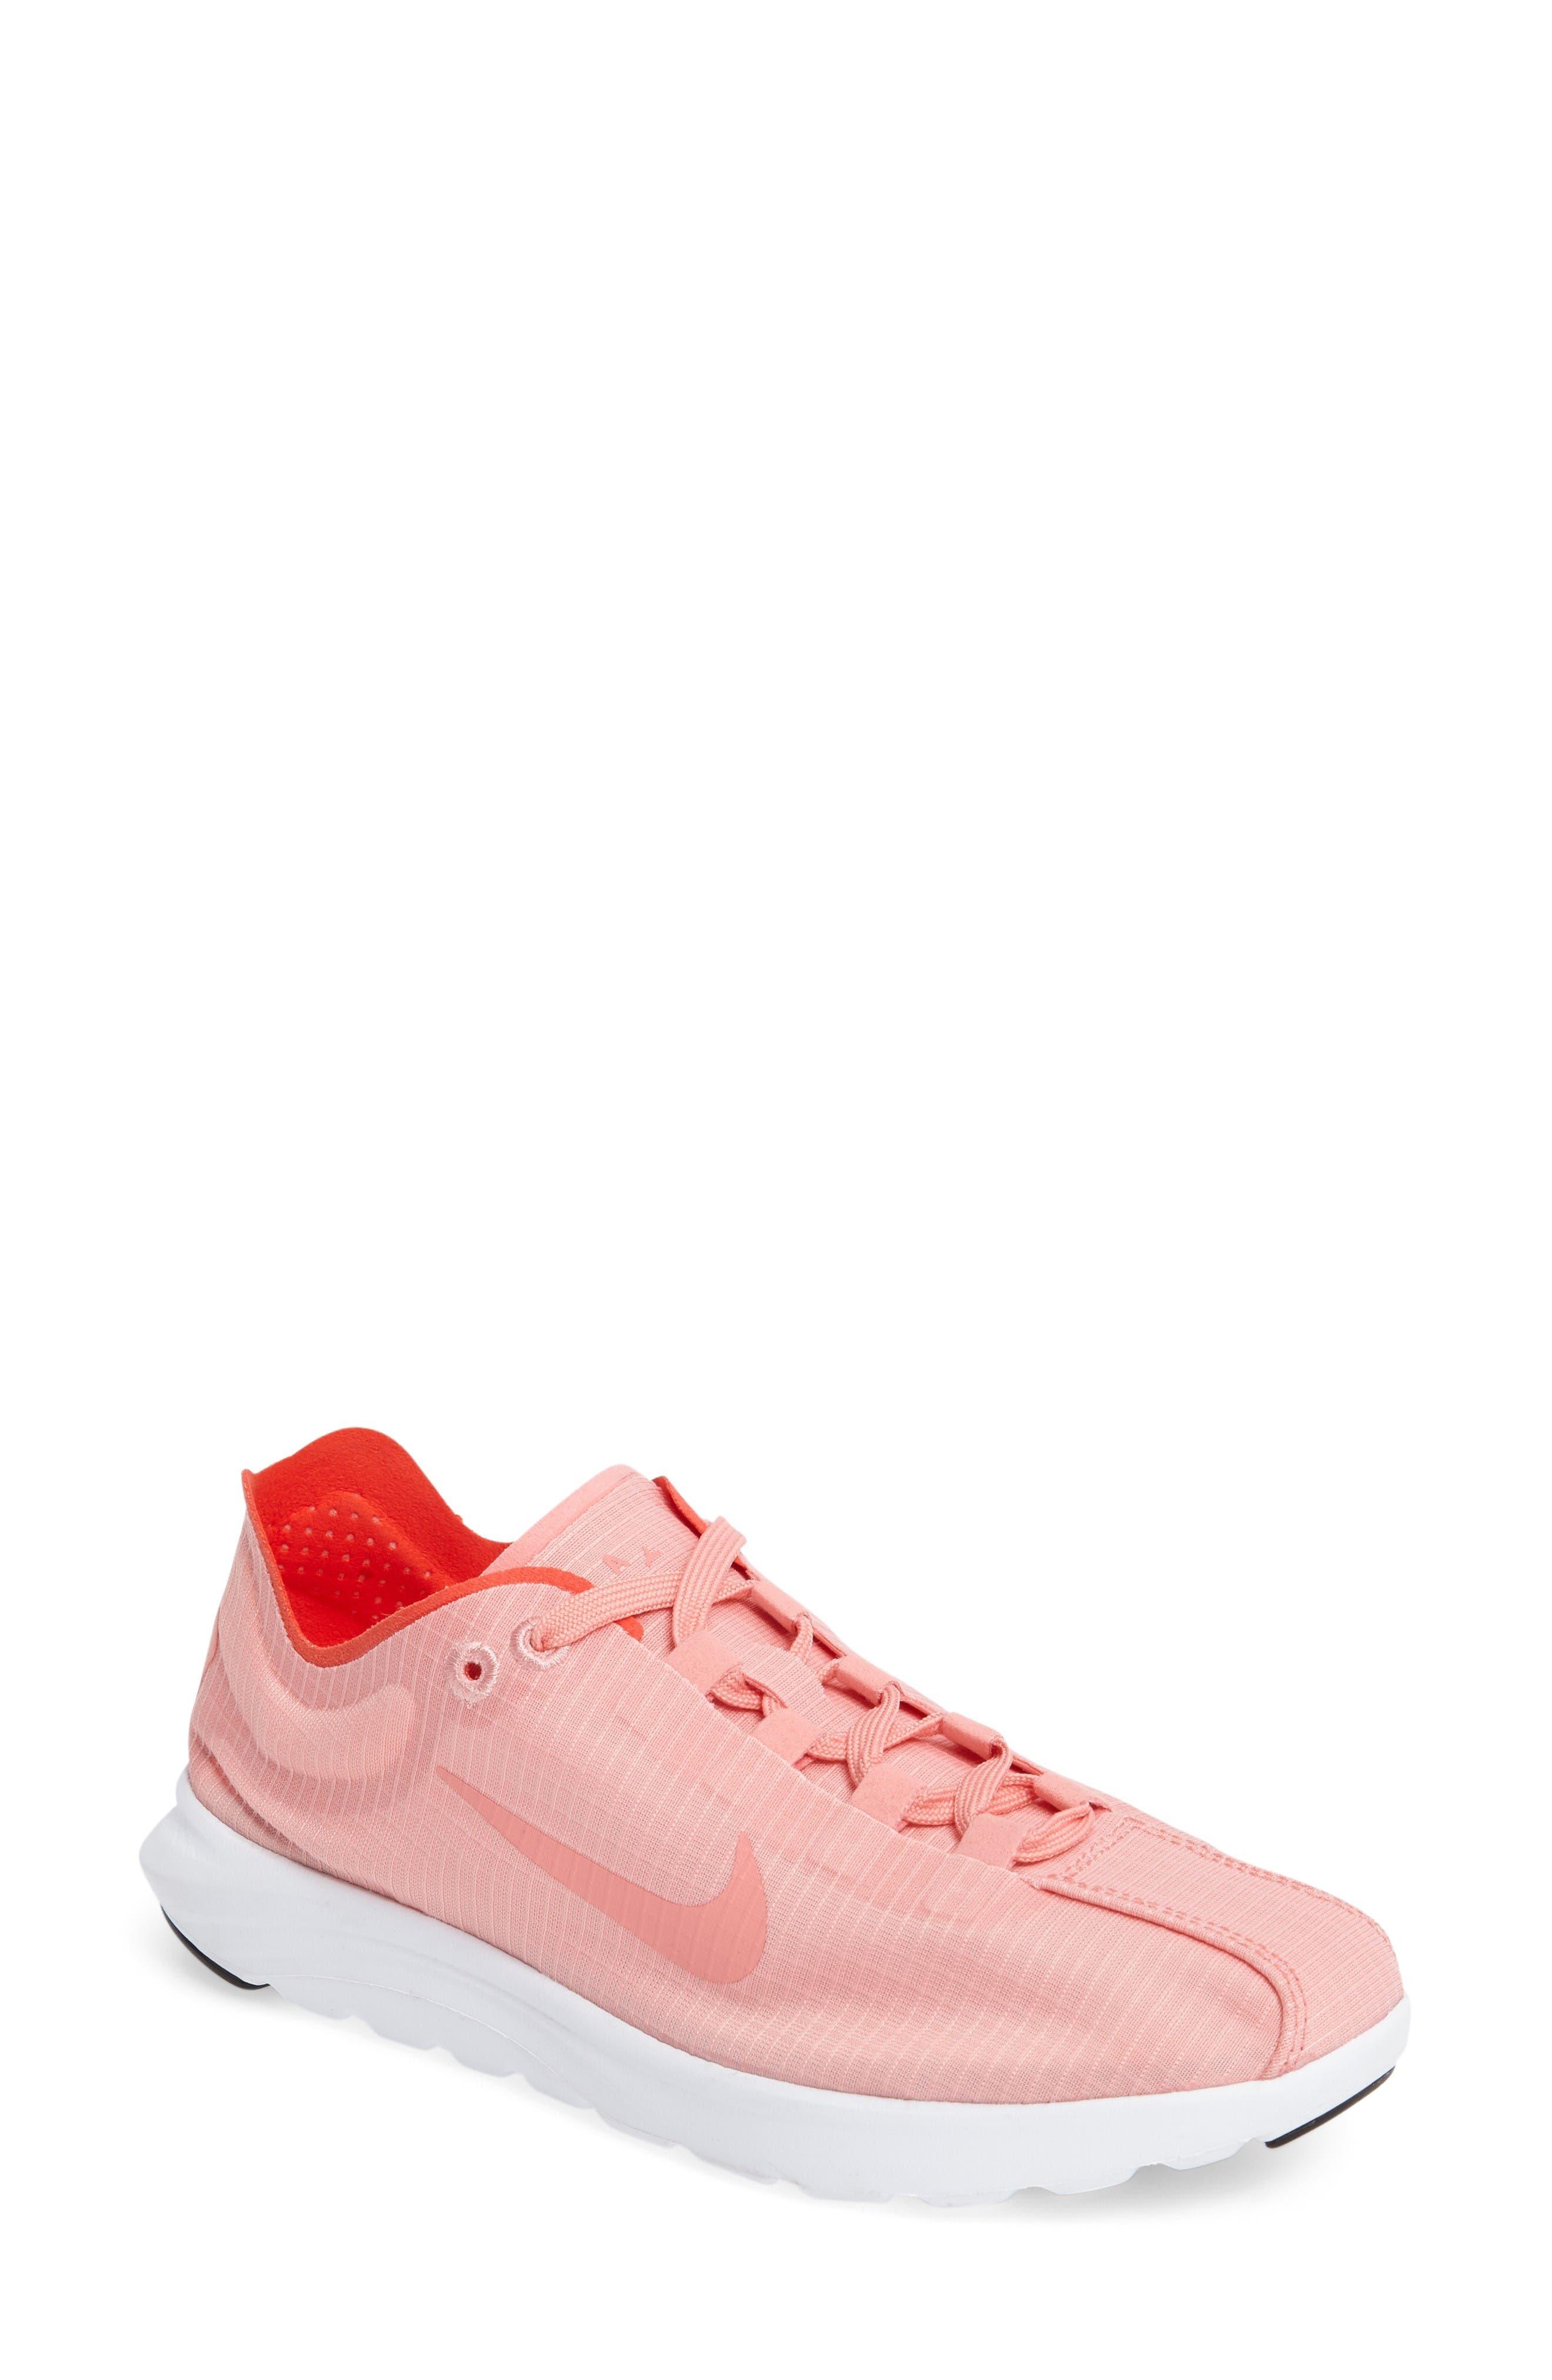 Alternate Image 1 Selected - Nike Mayfly Lite SE Sneaker (Women)